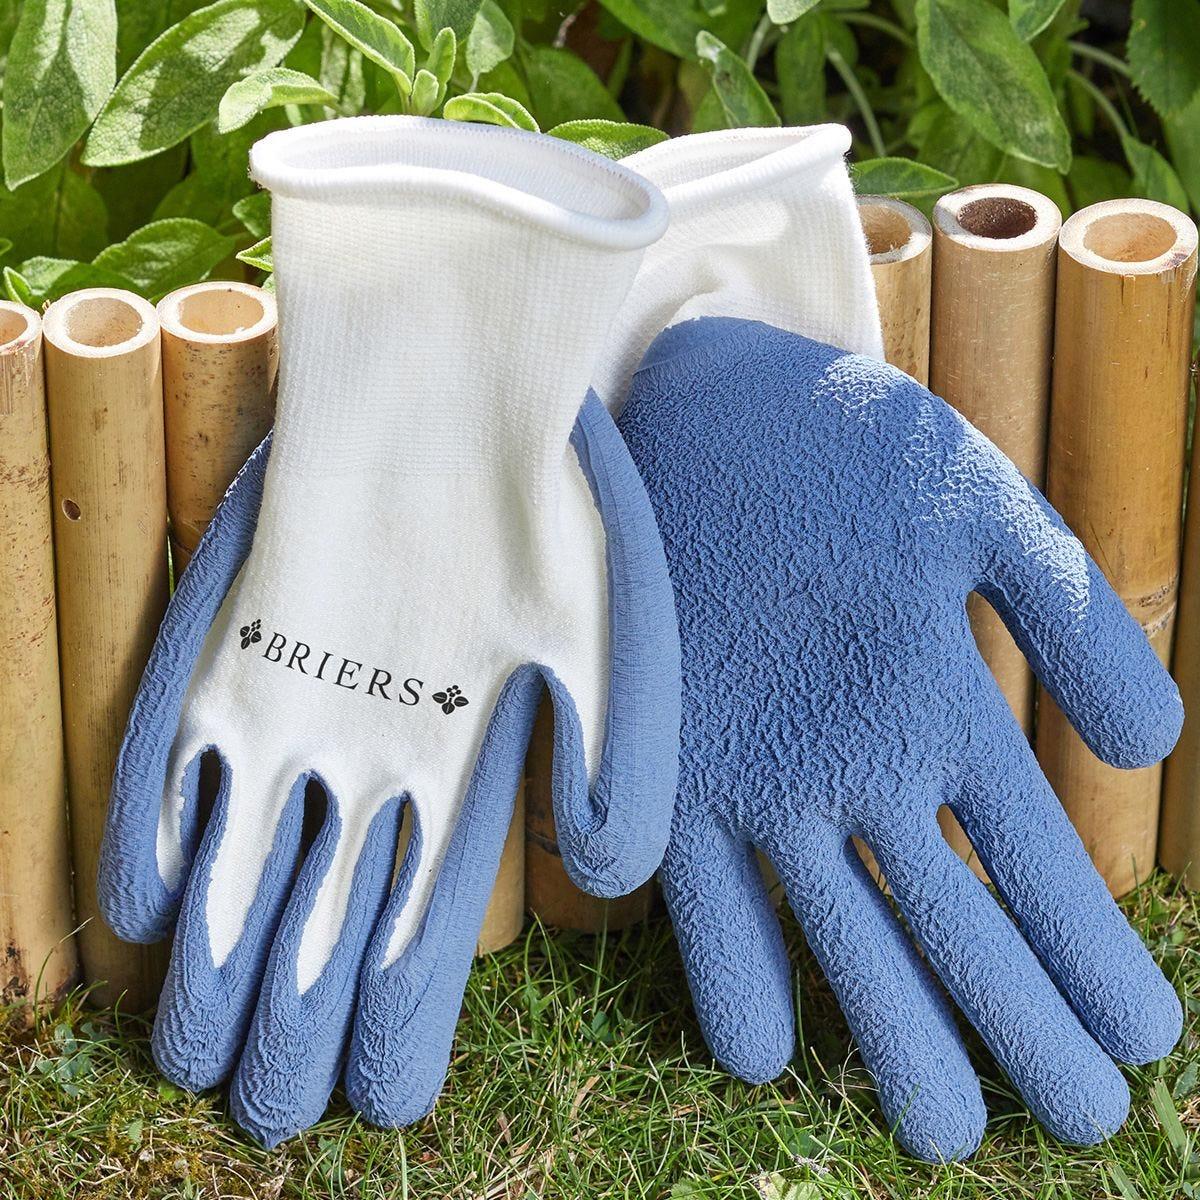 Briers Bamboo Grips Blue Garden Gloves - Small